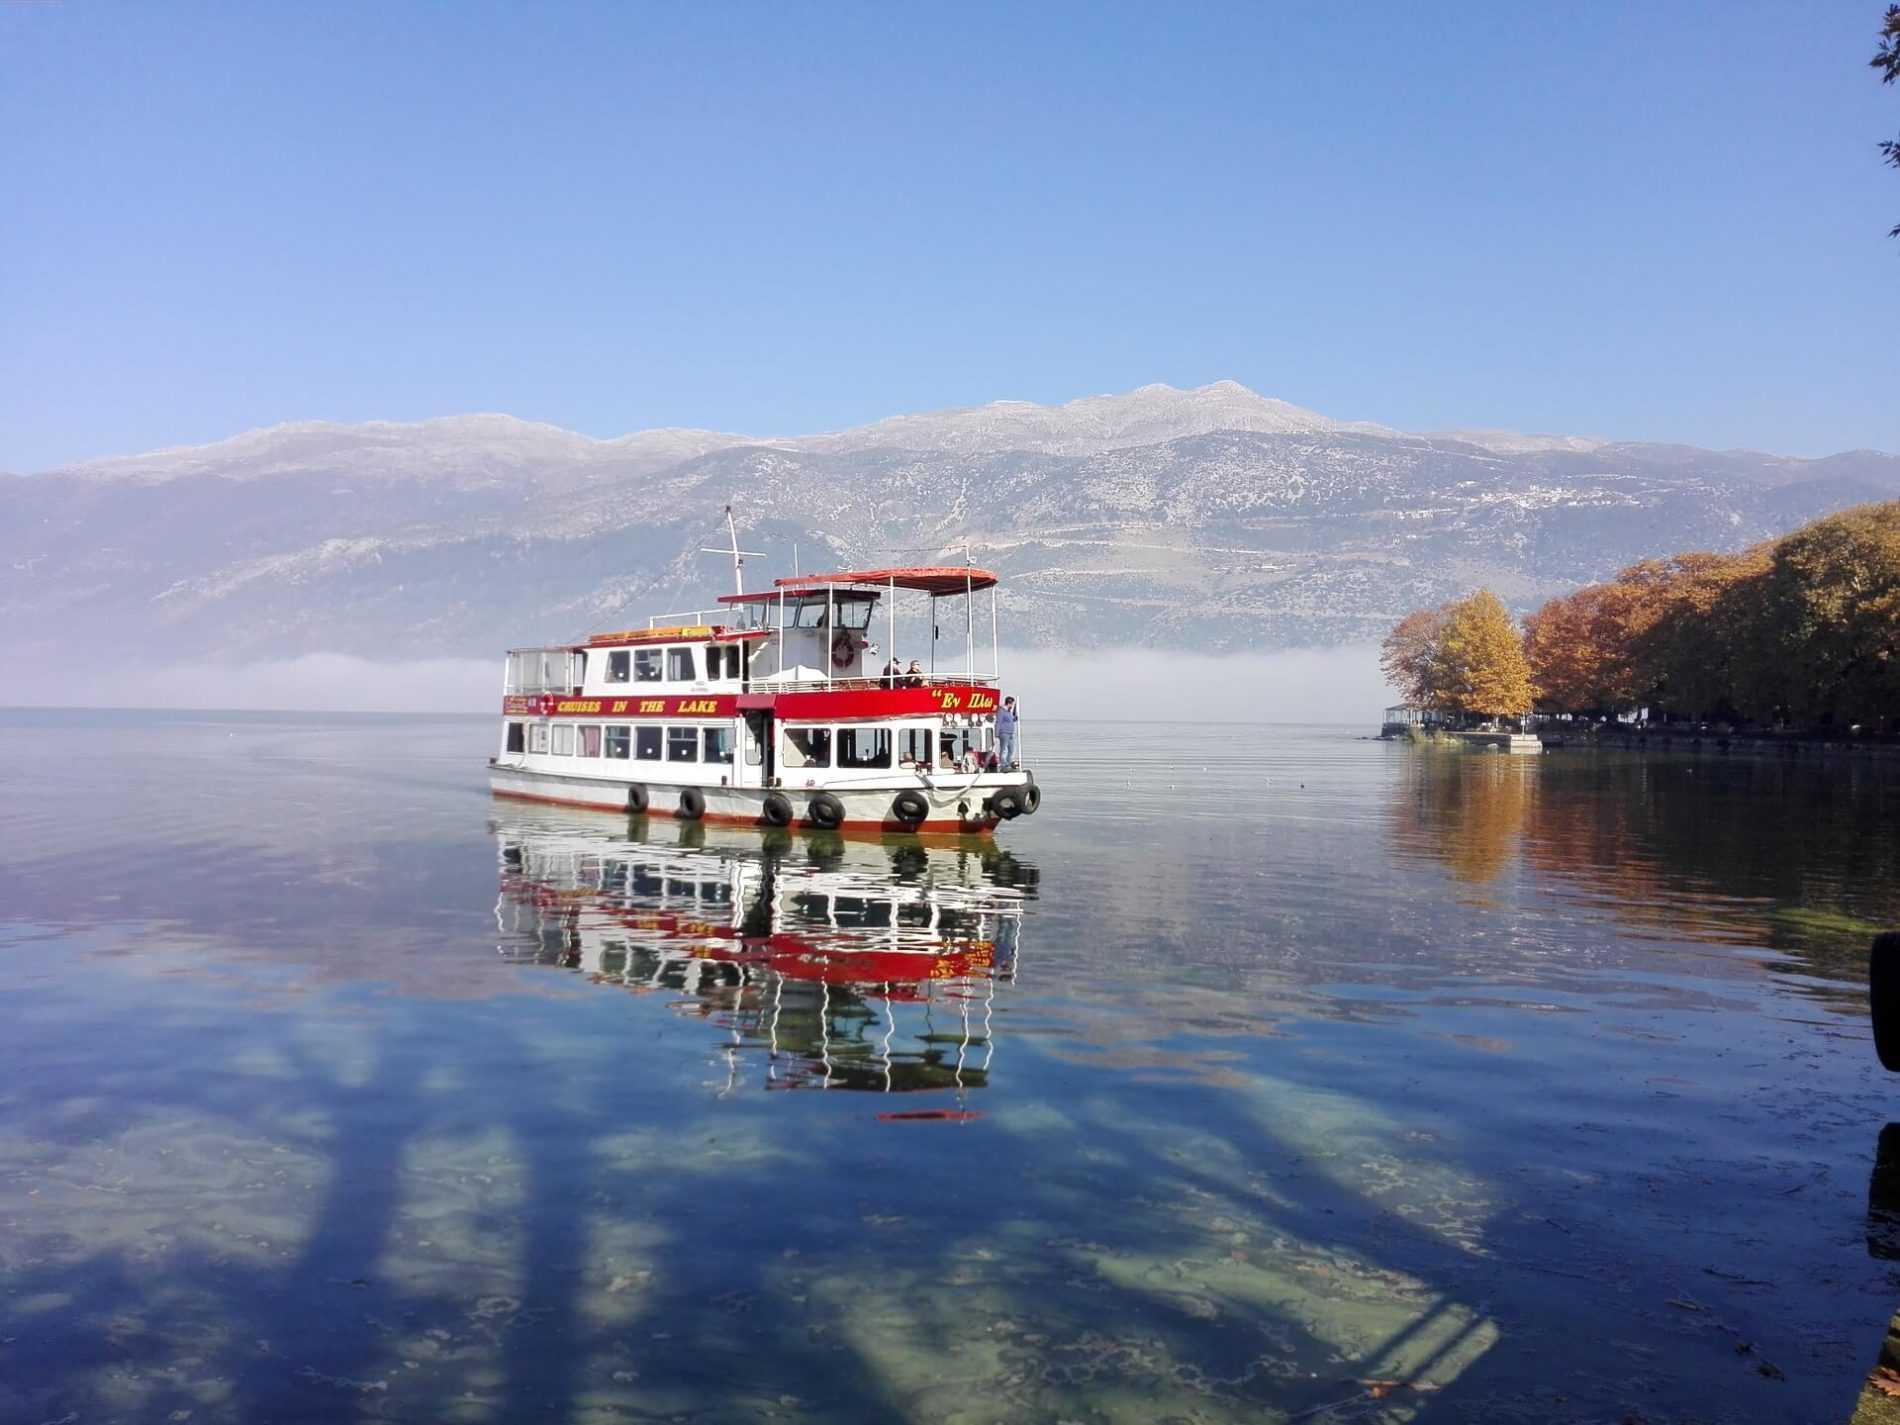 Griechenland Urlaub  Iioannina